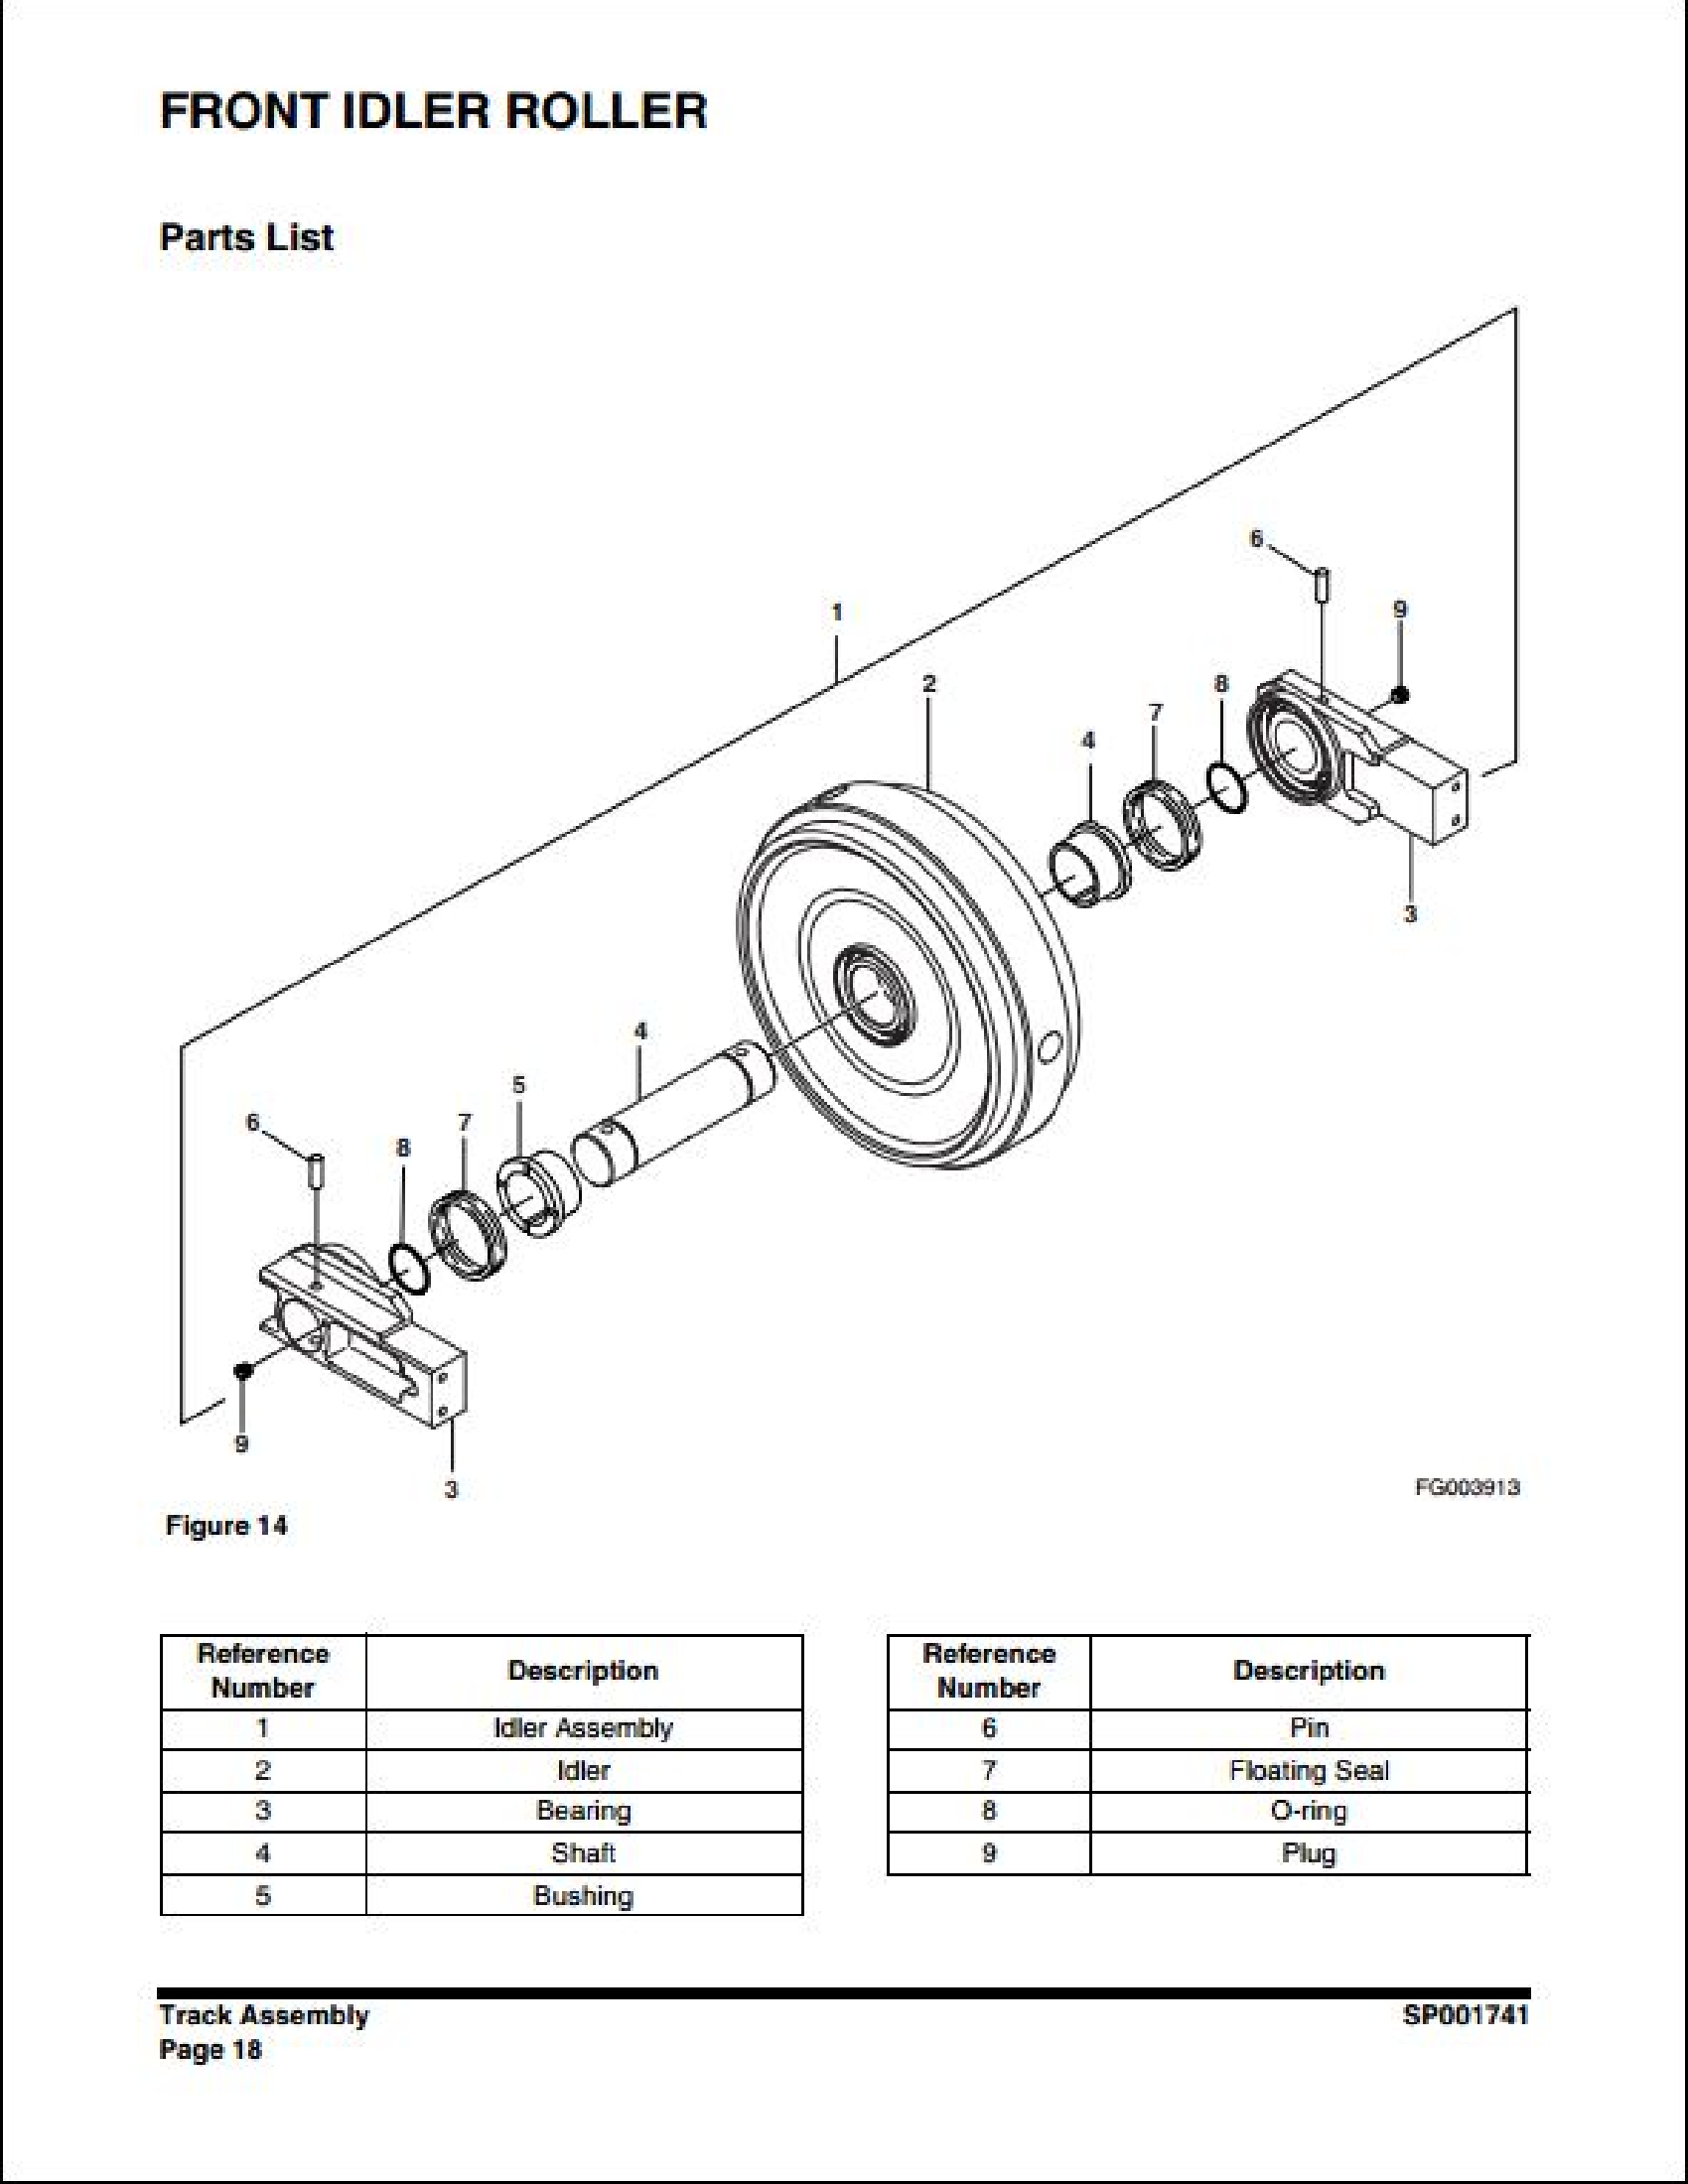 Doosan DX350LC Crawled Excavator manual